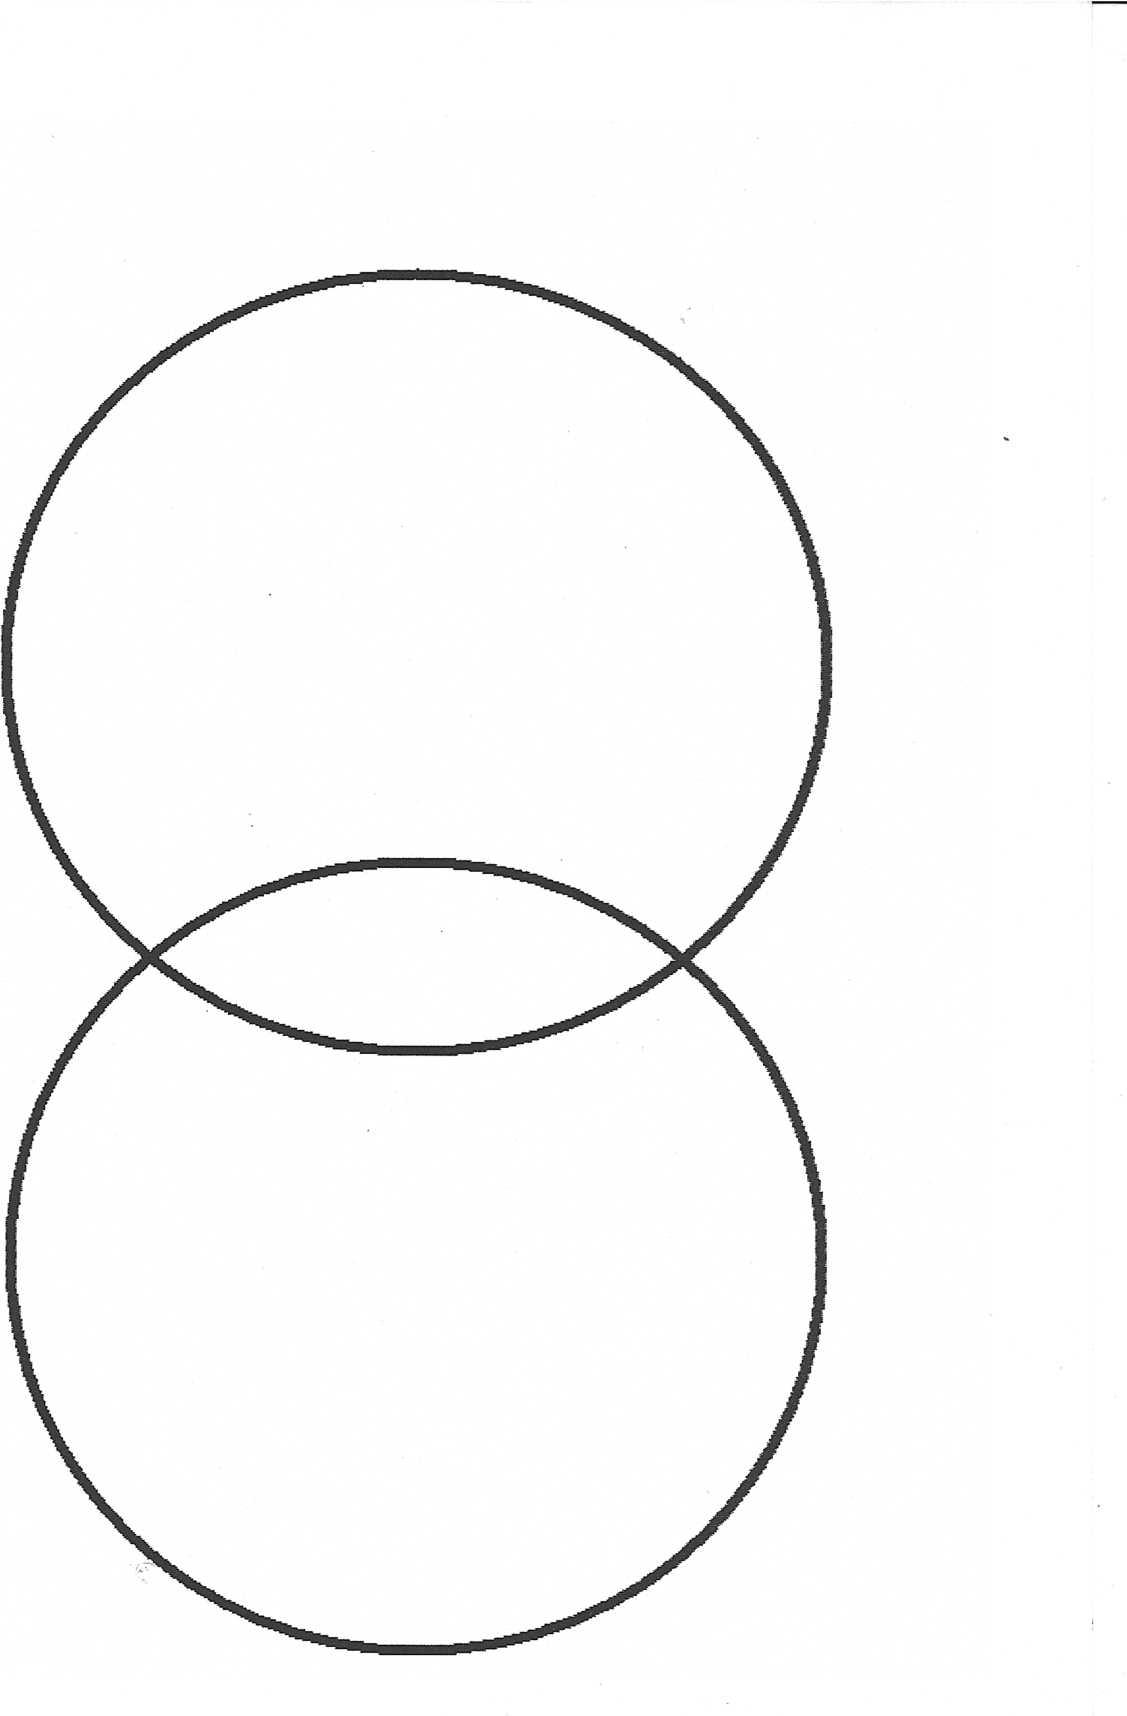 картинки кругов множество последнее время